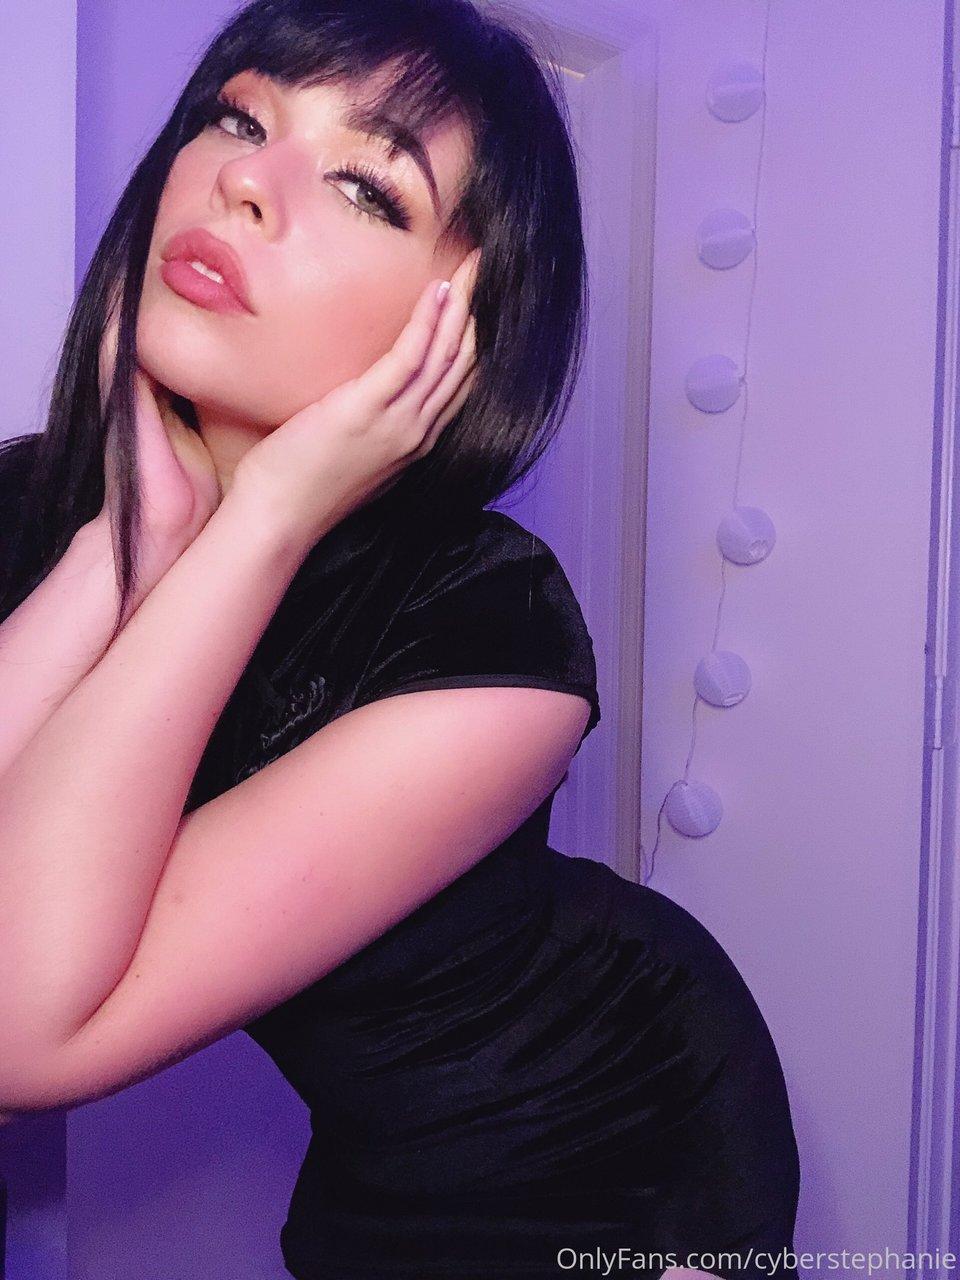 Stephanie Santos Cyberstephanie Onlyfans Hot Photos Leaks 0006